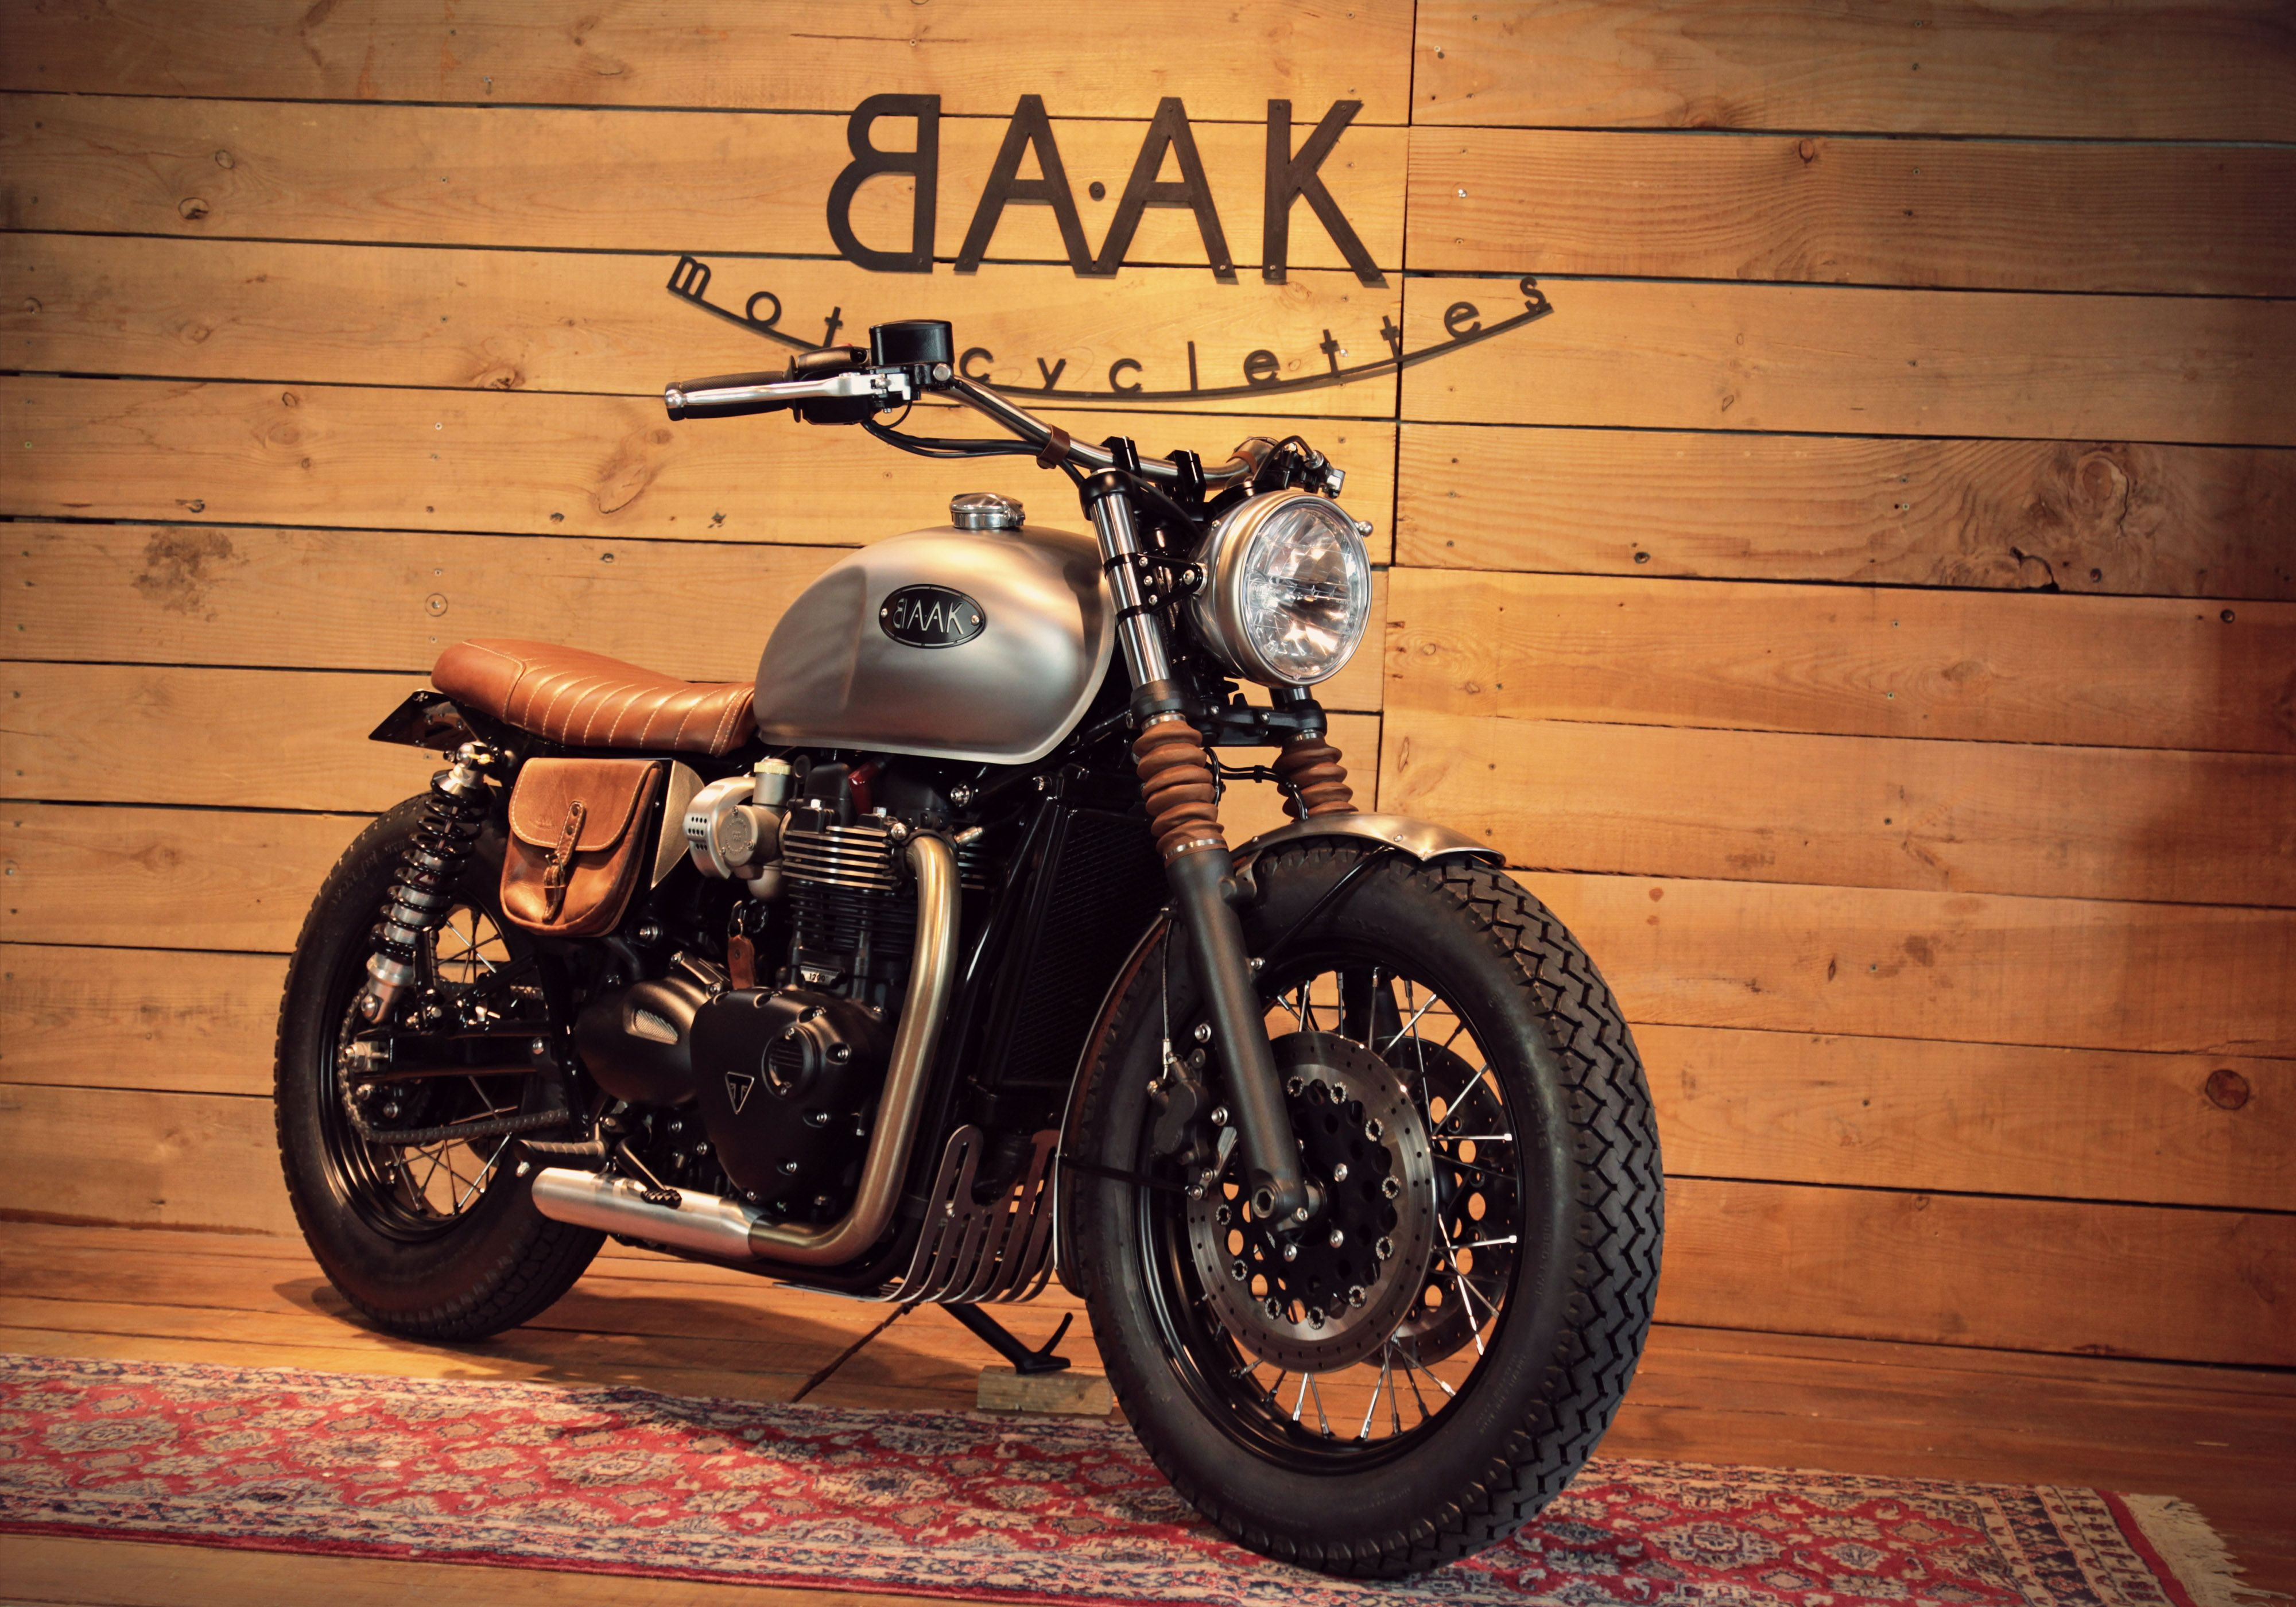 Custom 2017 Triumph Bonneville T120 Created By Baak Motocyclettes